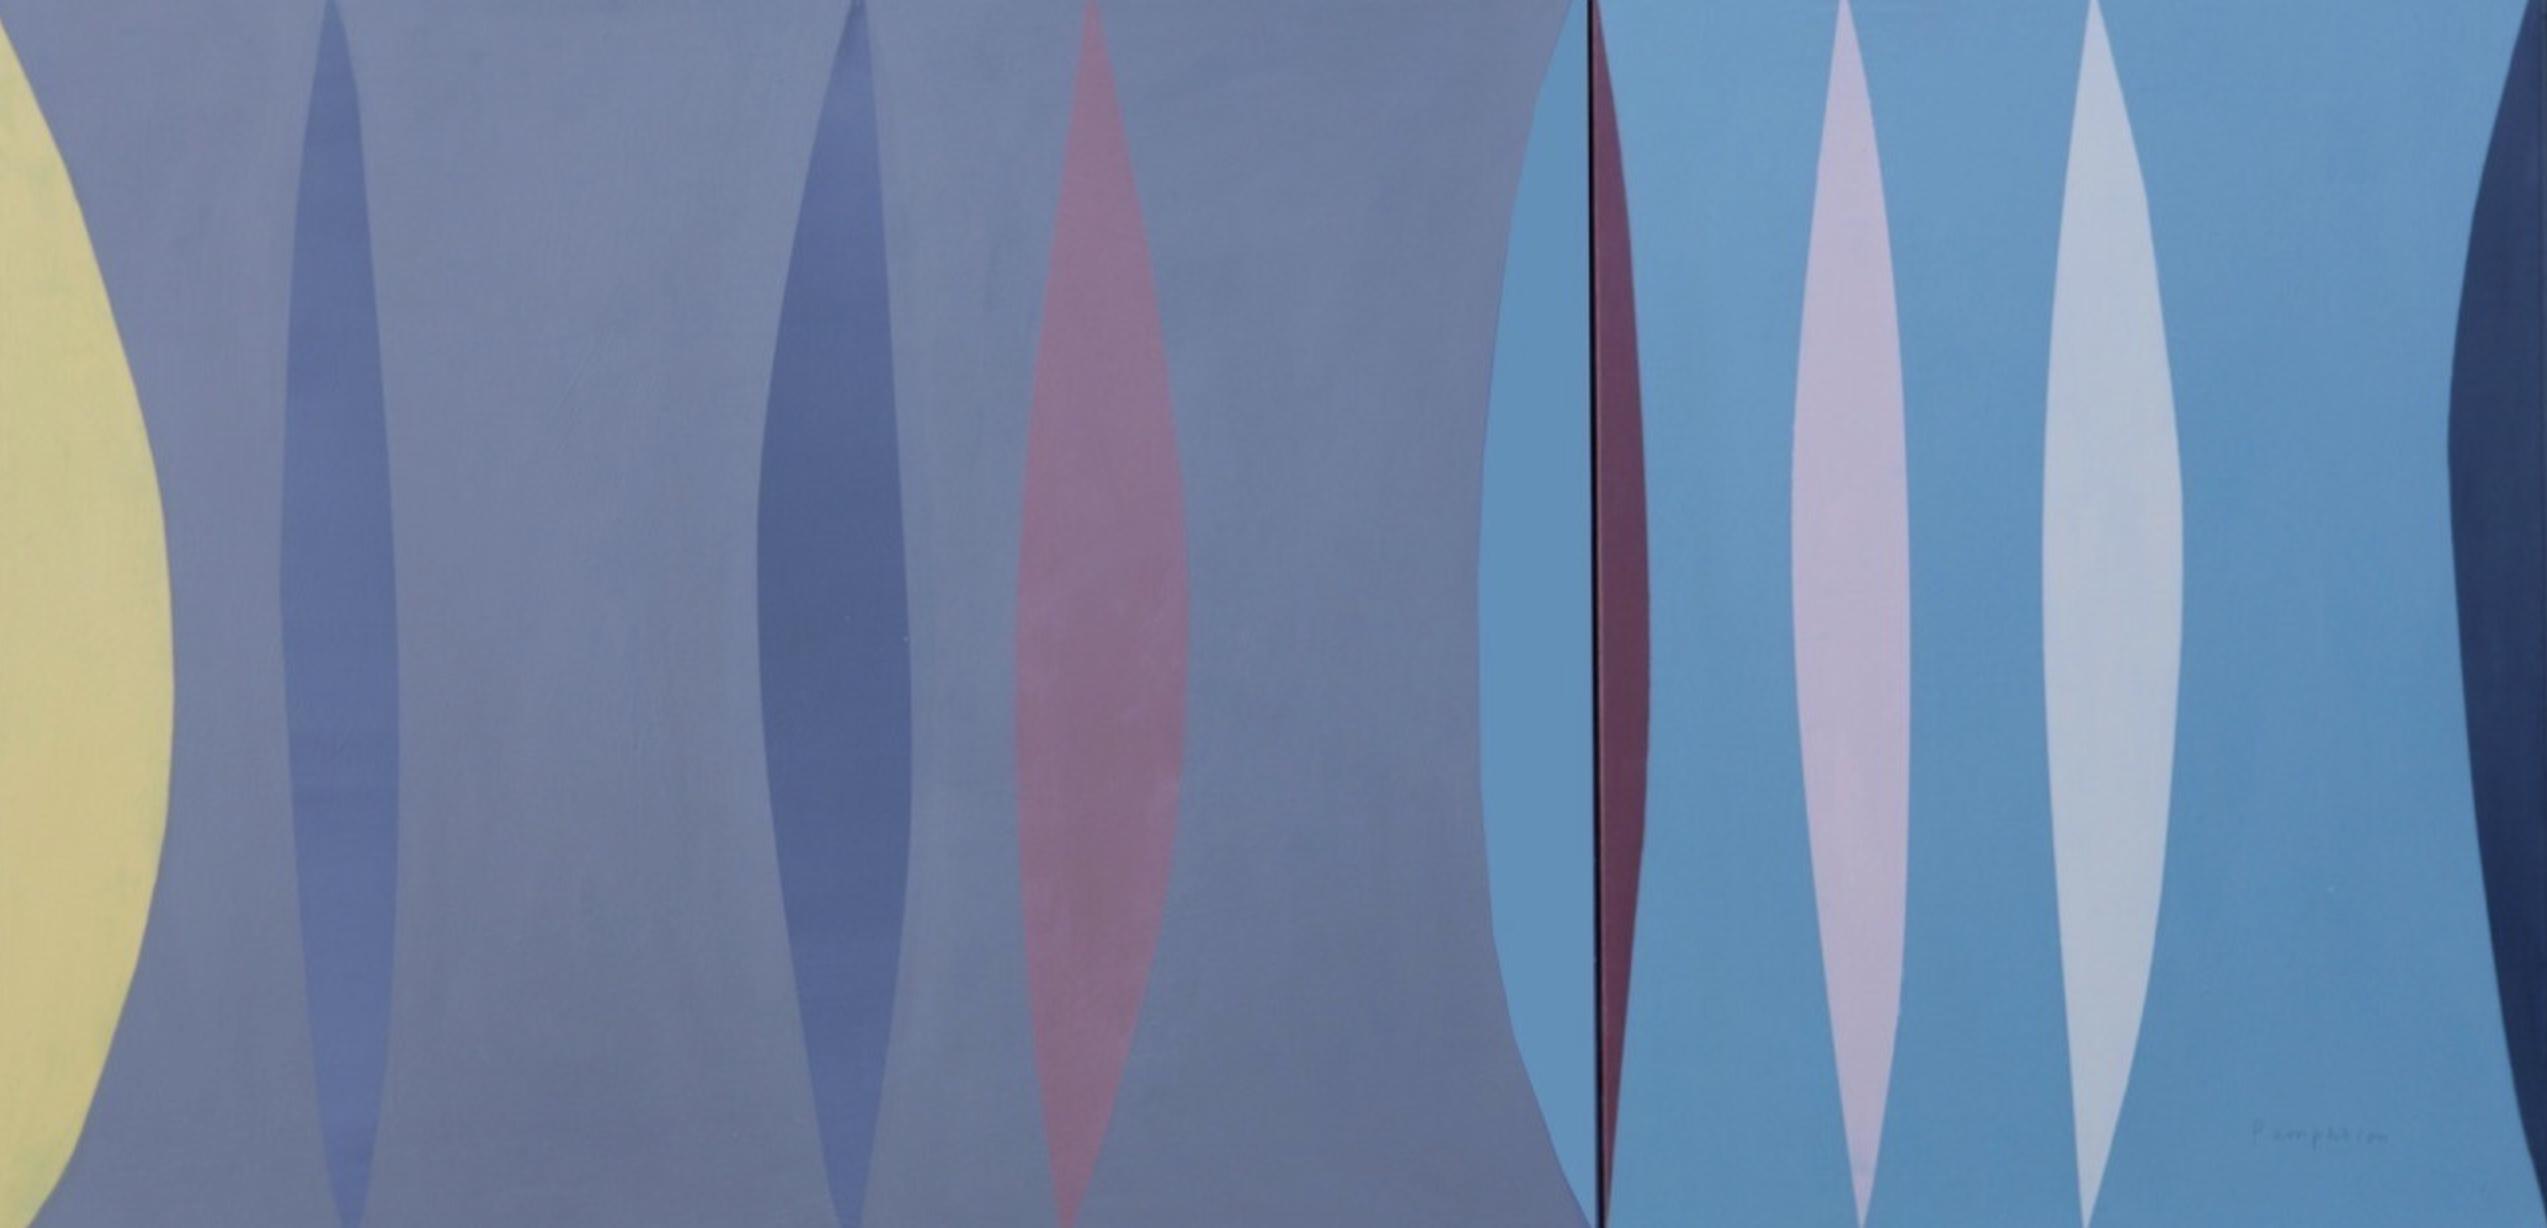 Porthmeor mixed media on canvas 80 x 160 cm £7,950